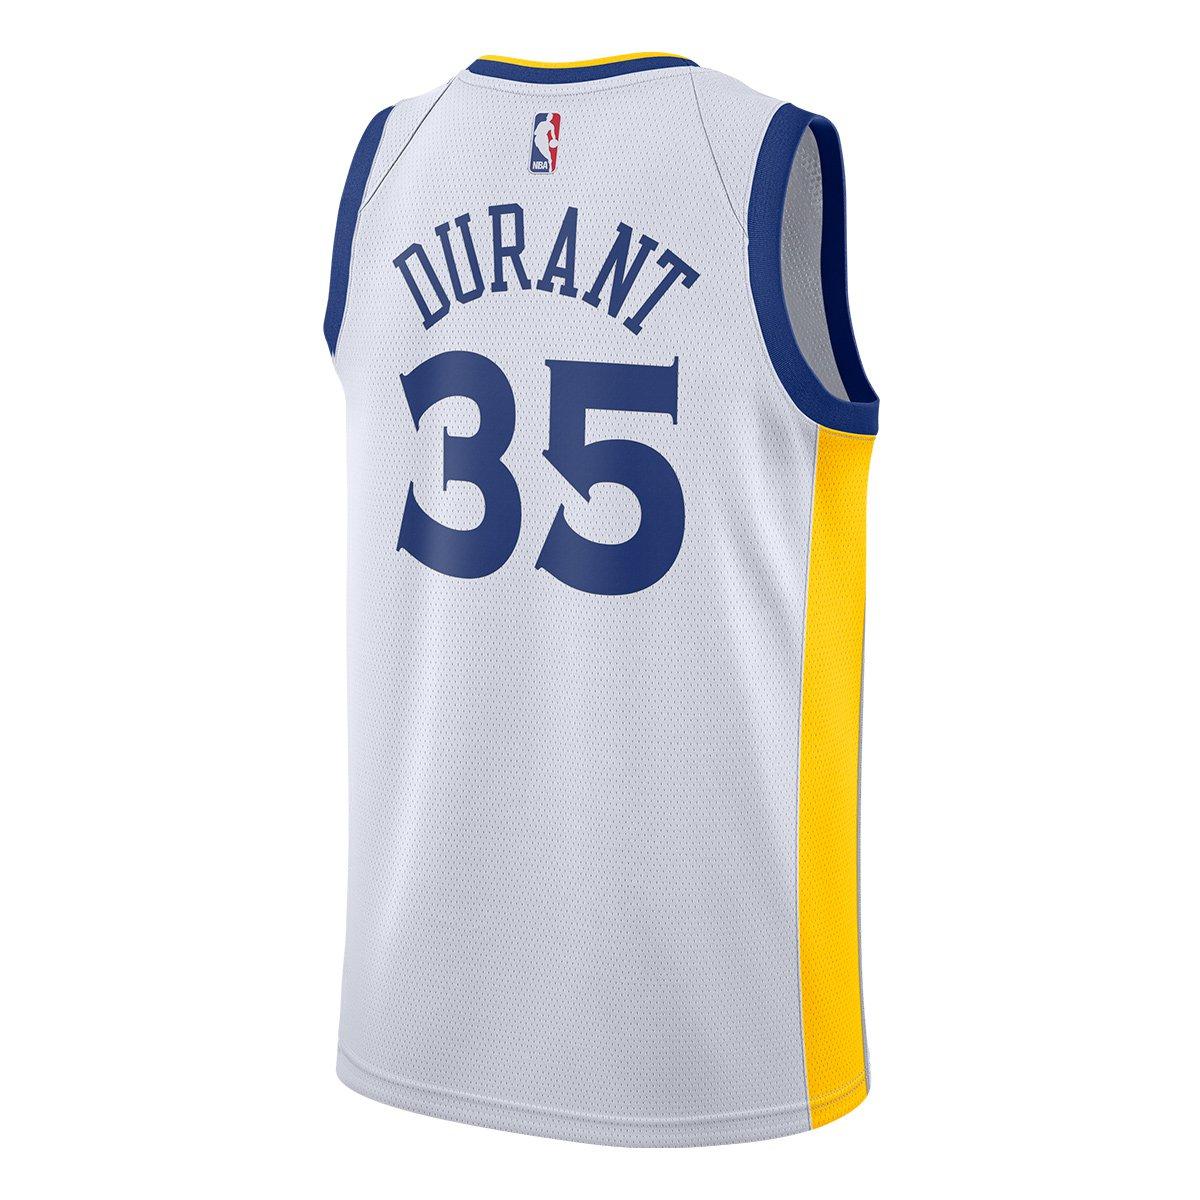 37f043f1c0 Regata Nike Golden State Warriors Kevin Durant Swigman JSY Masculina -  Compre Agora